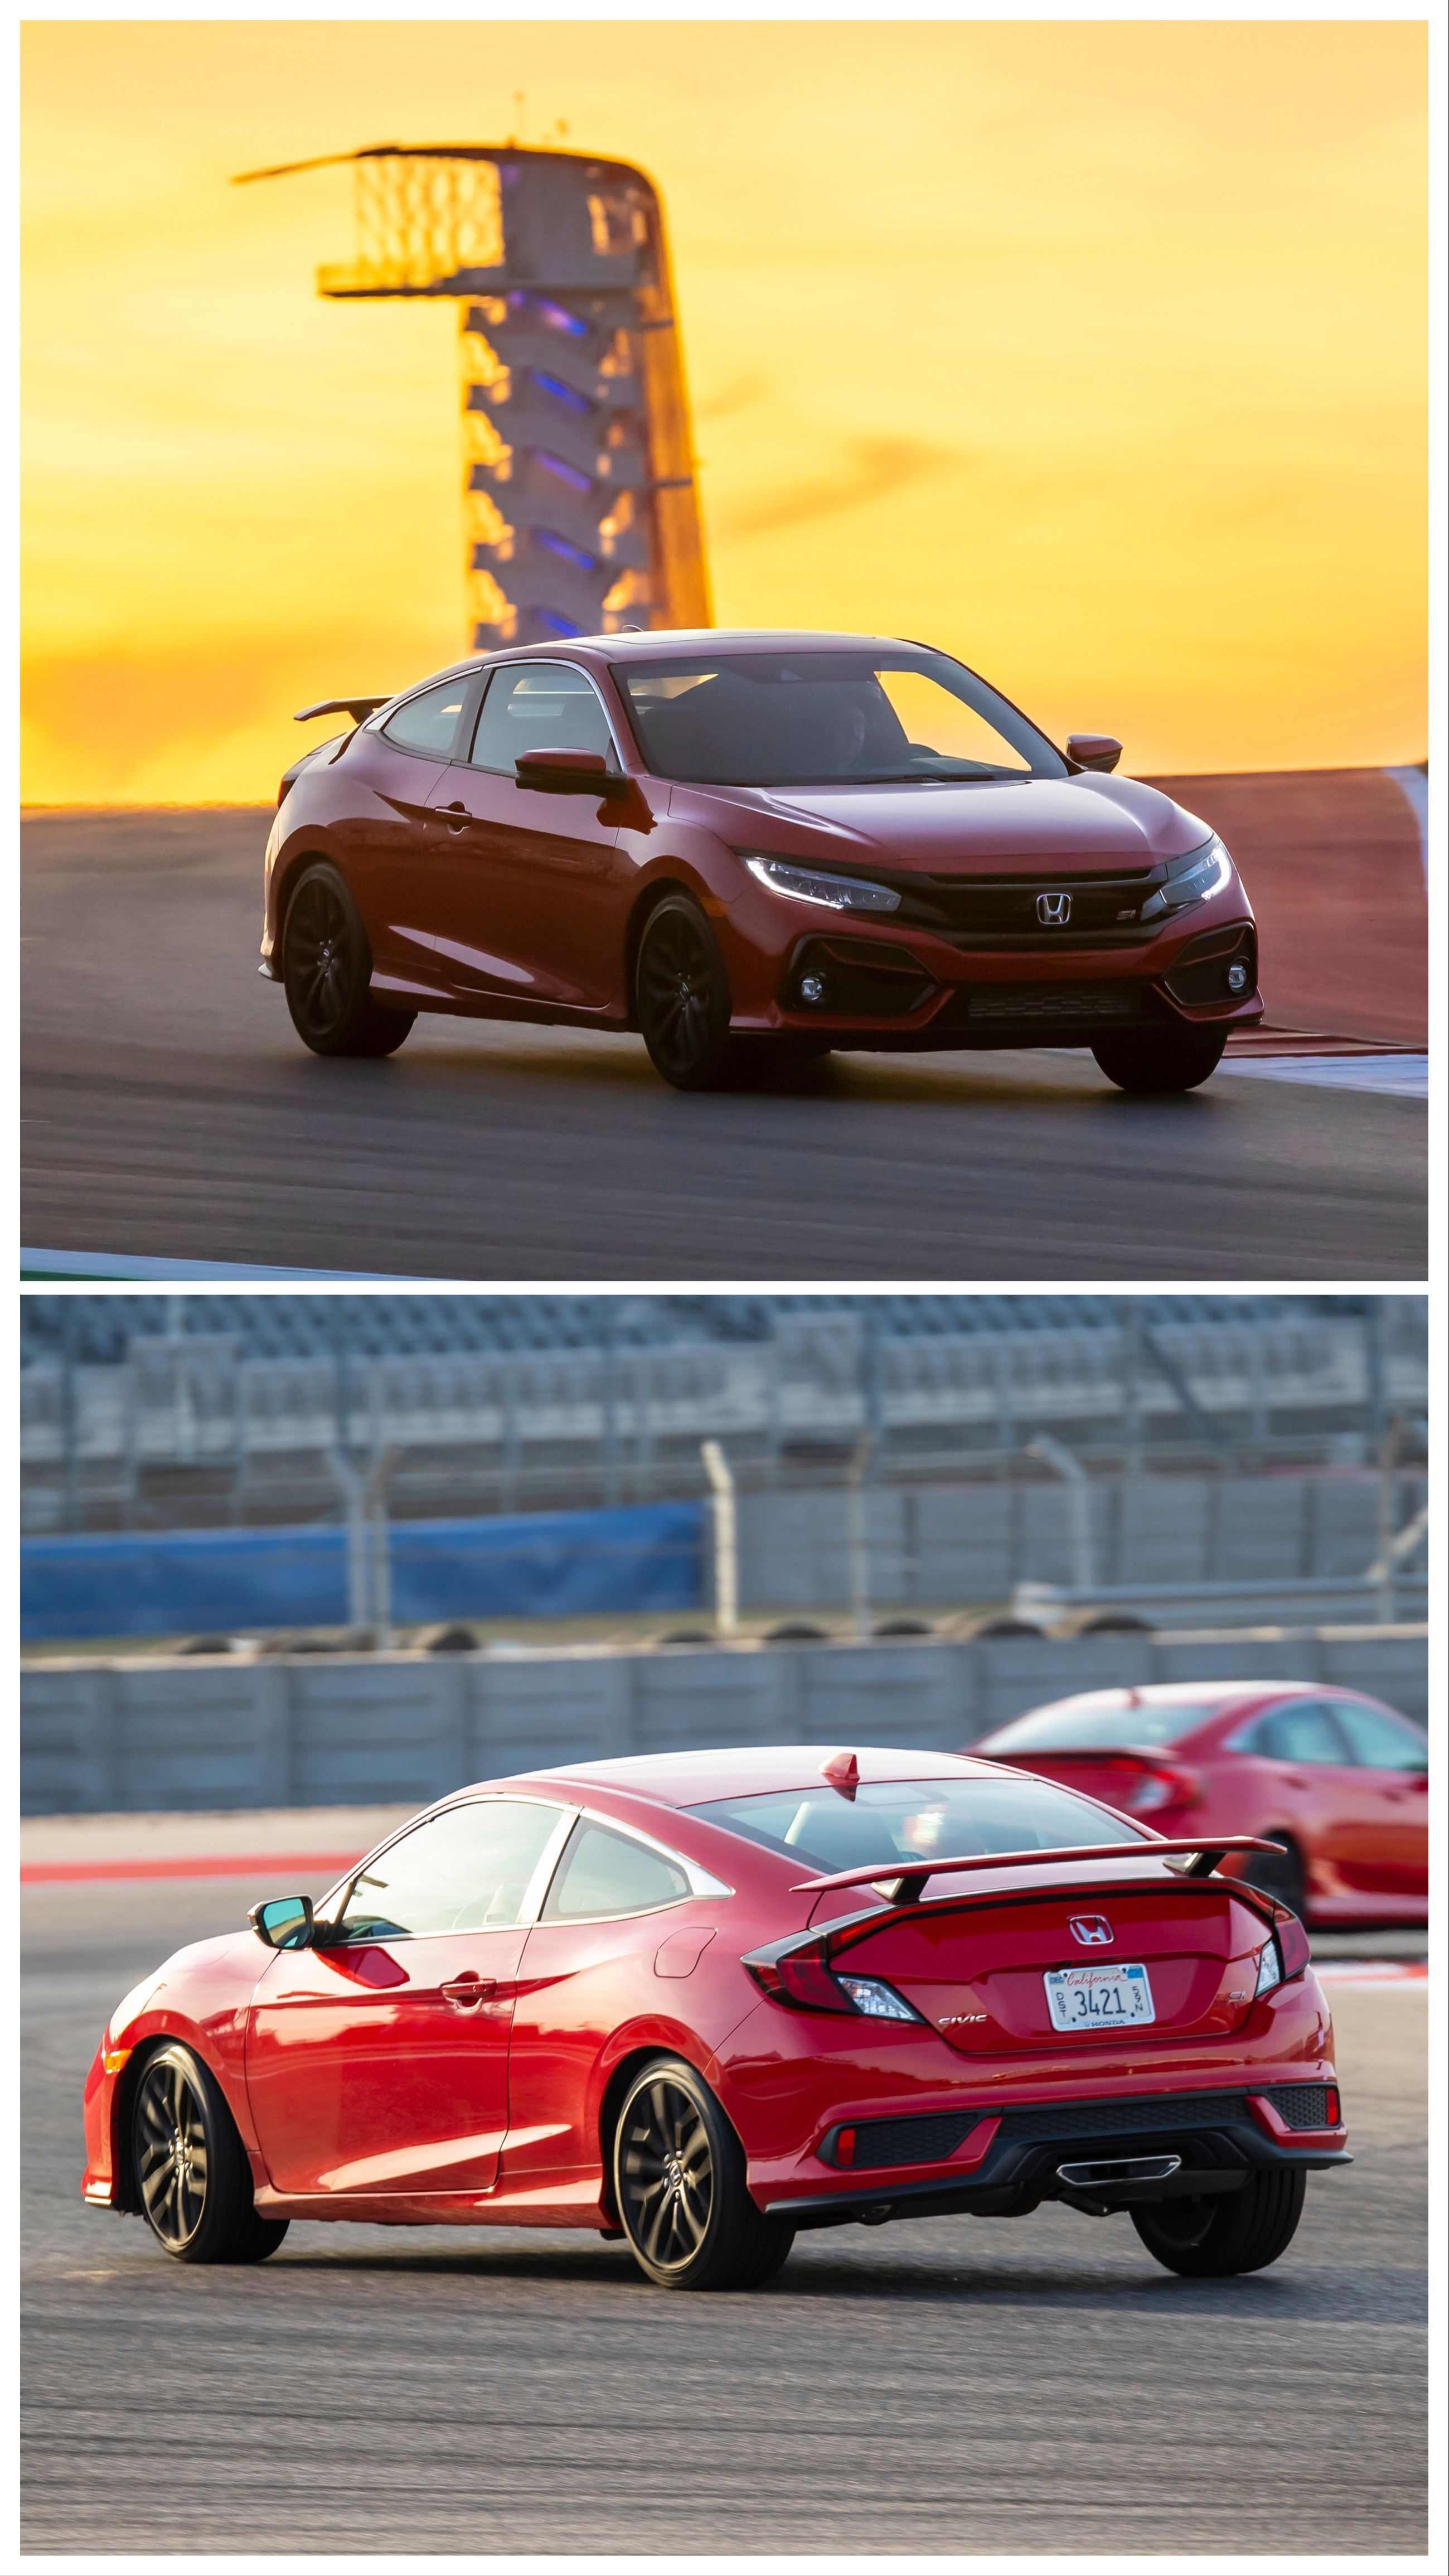 2020 Honda Civic Si Coupe and Sedan Review Honda civic